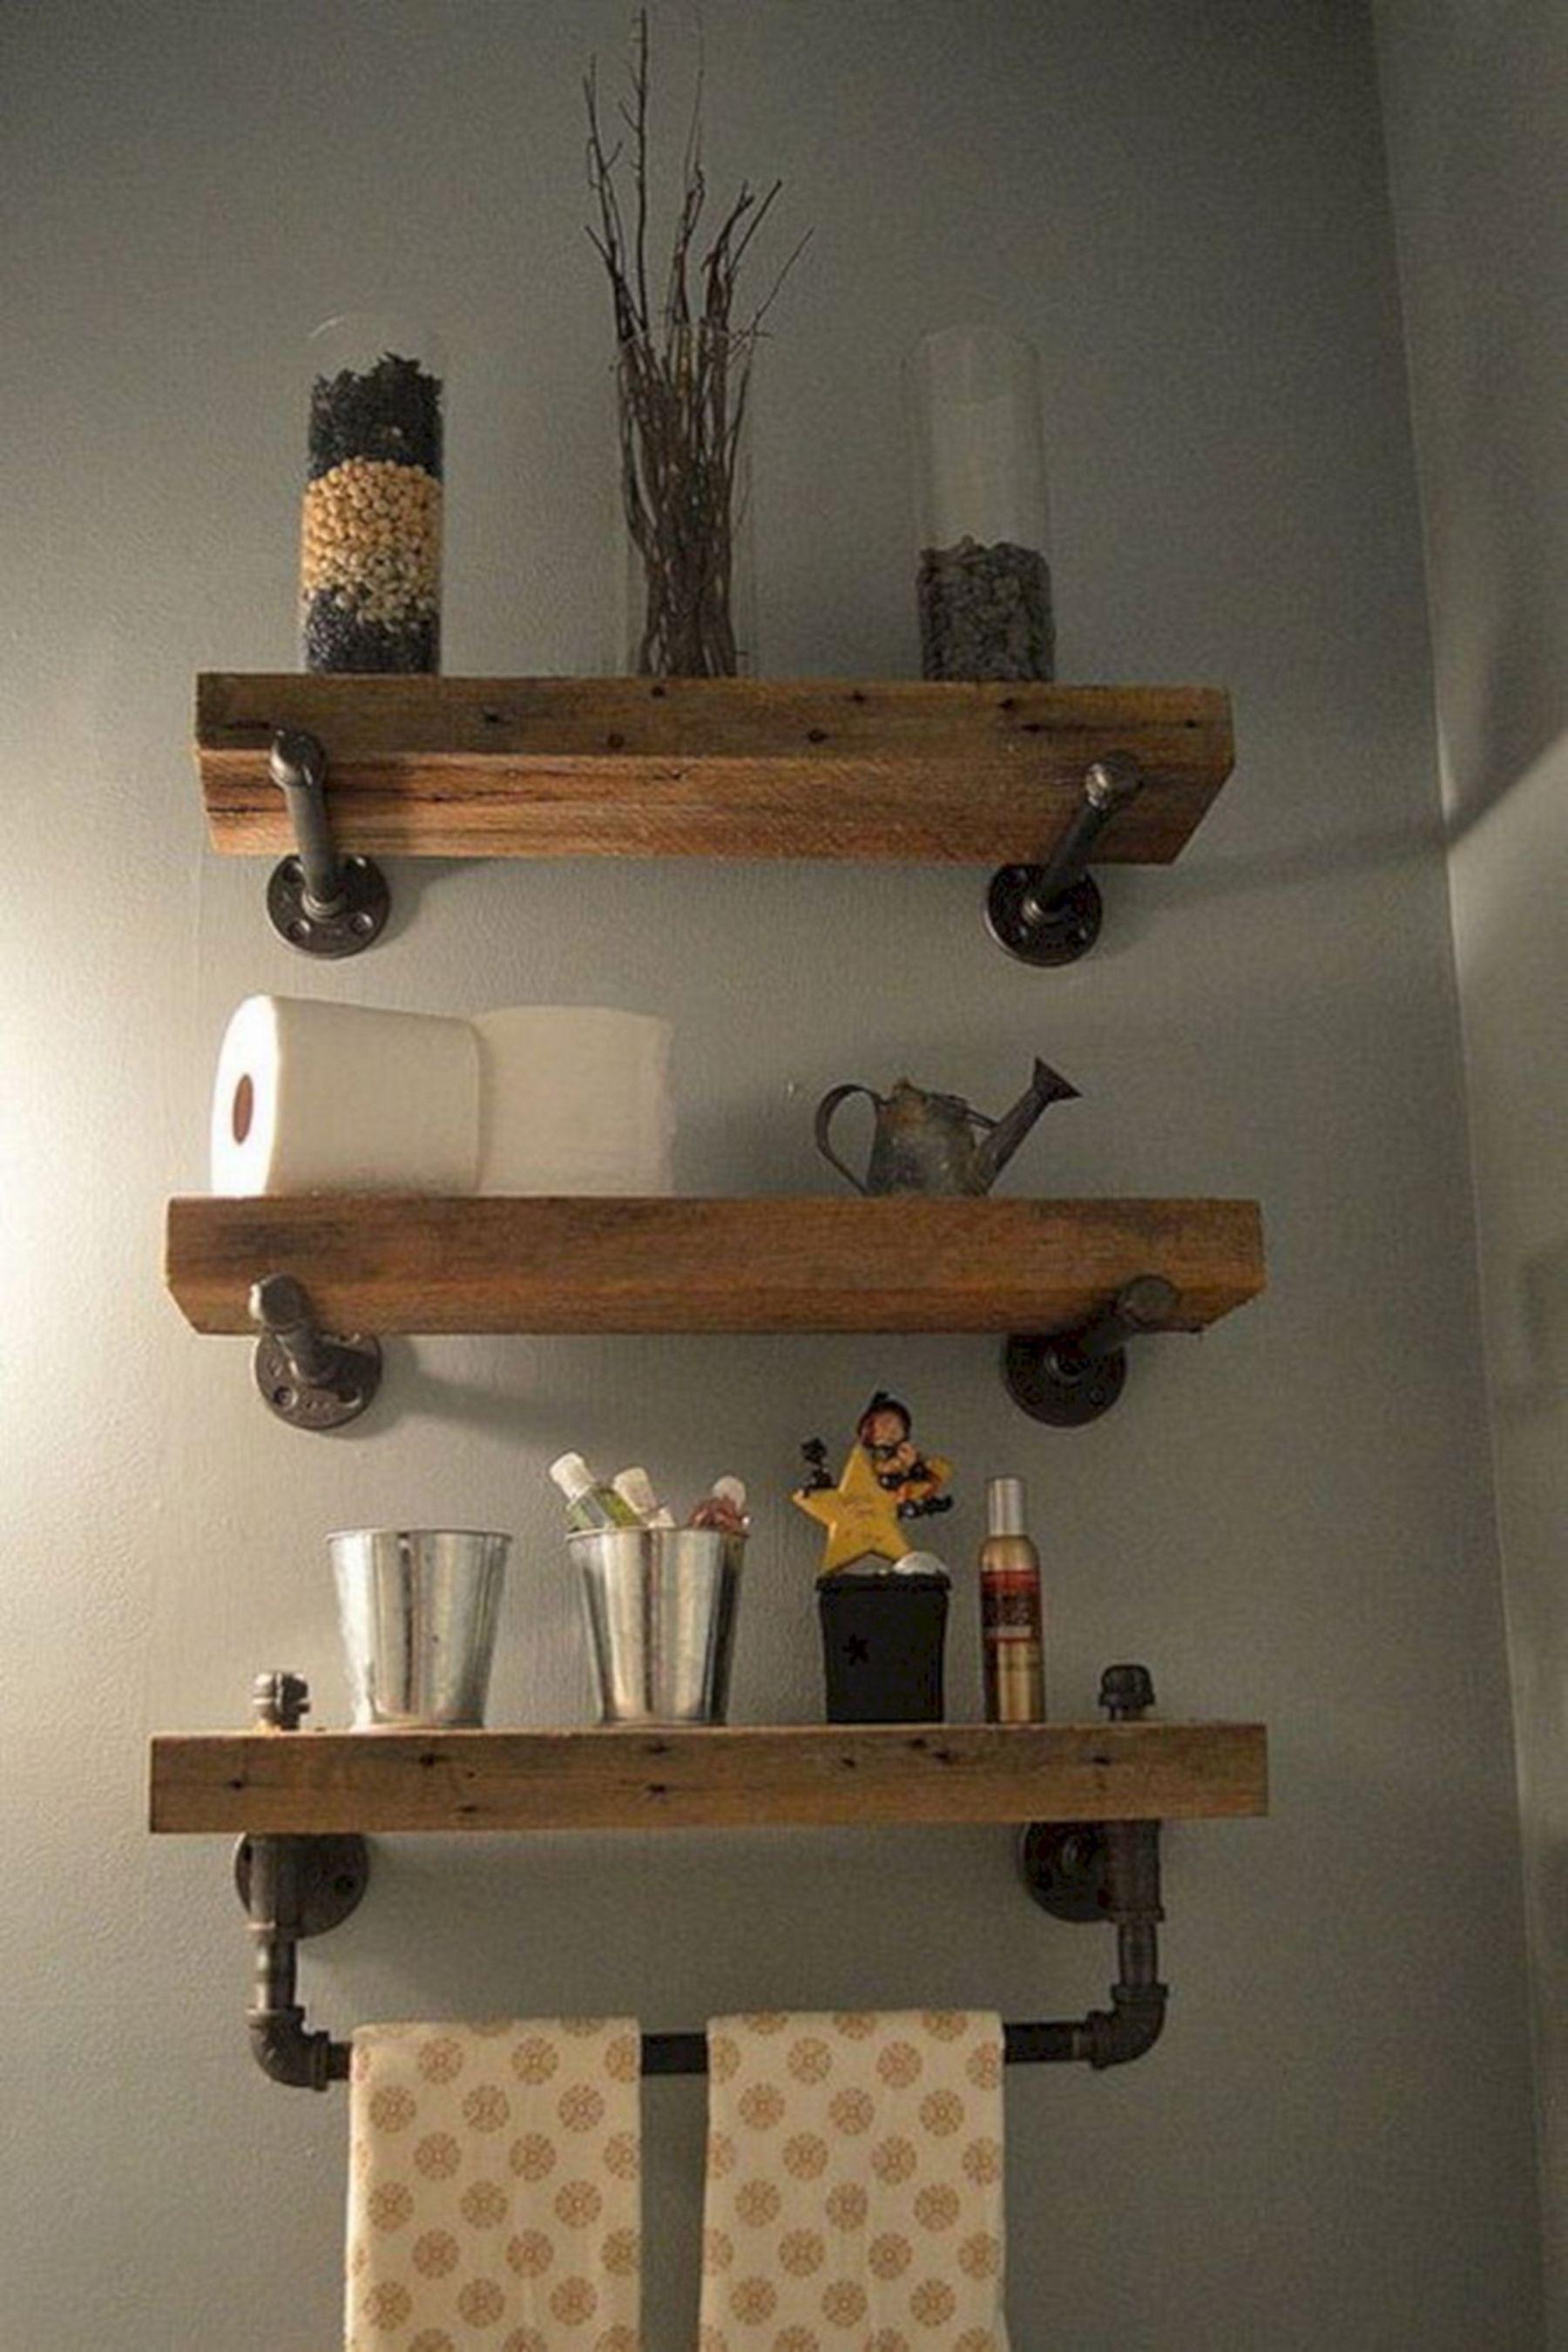 10 Simple And Cheap Diy Wooden Shelf Design Ideas For Your Bathroom Comfort Rustic Bathroom Decor Barn Wood Bathroom Rustic Bathroom Designs